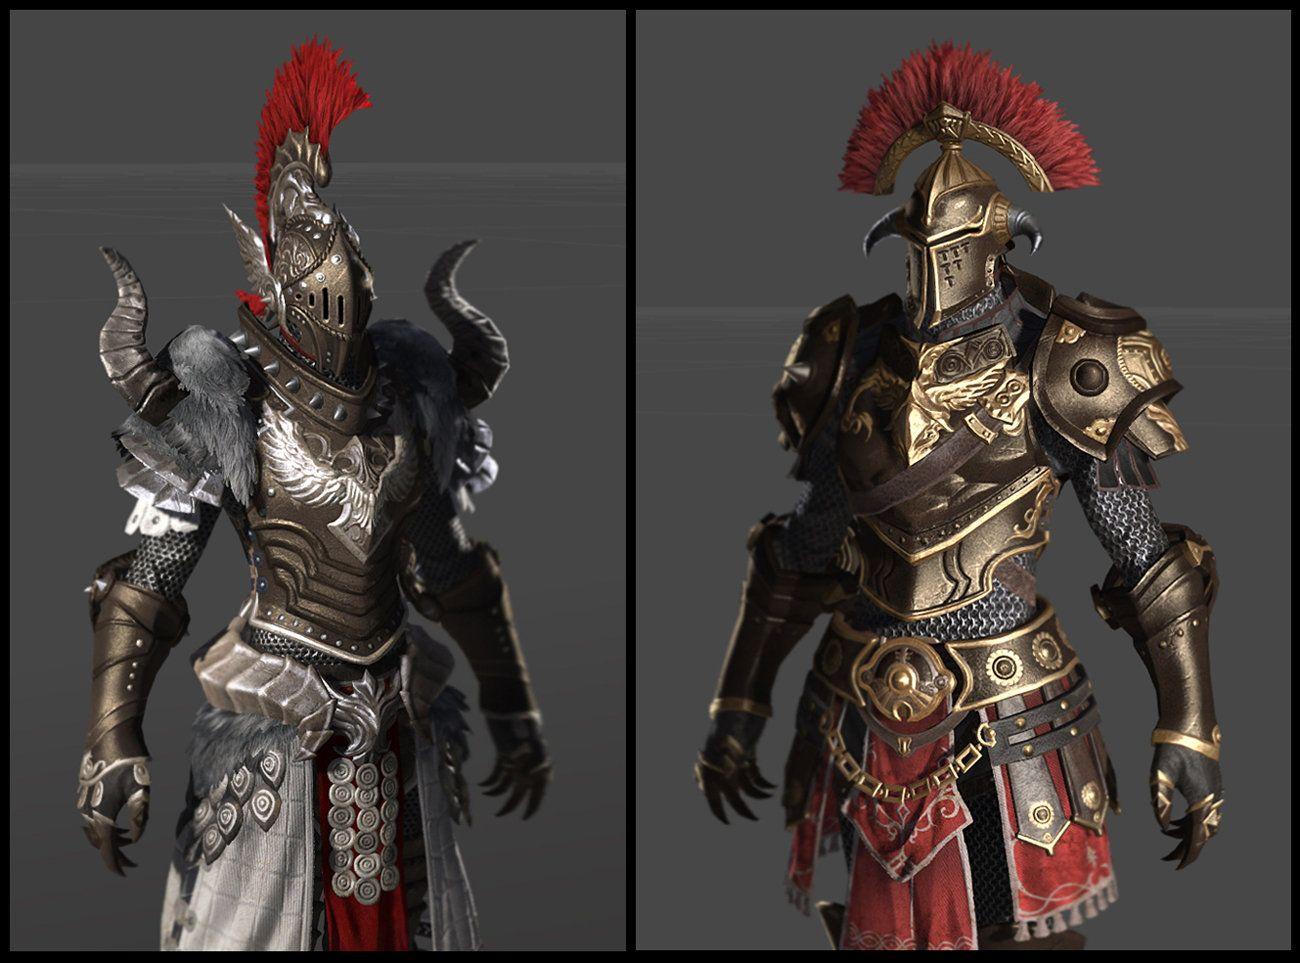 ..armor.., kim tae-hyun on ArtStation at http://www.artstation.com/artwork/armor-3153a6ab-60e2-4ecf-82d2-c73ba0e99eae